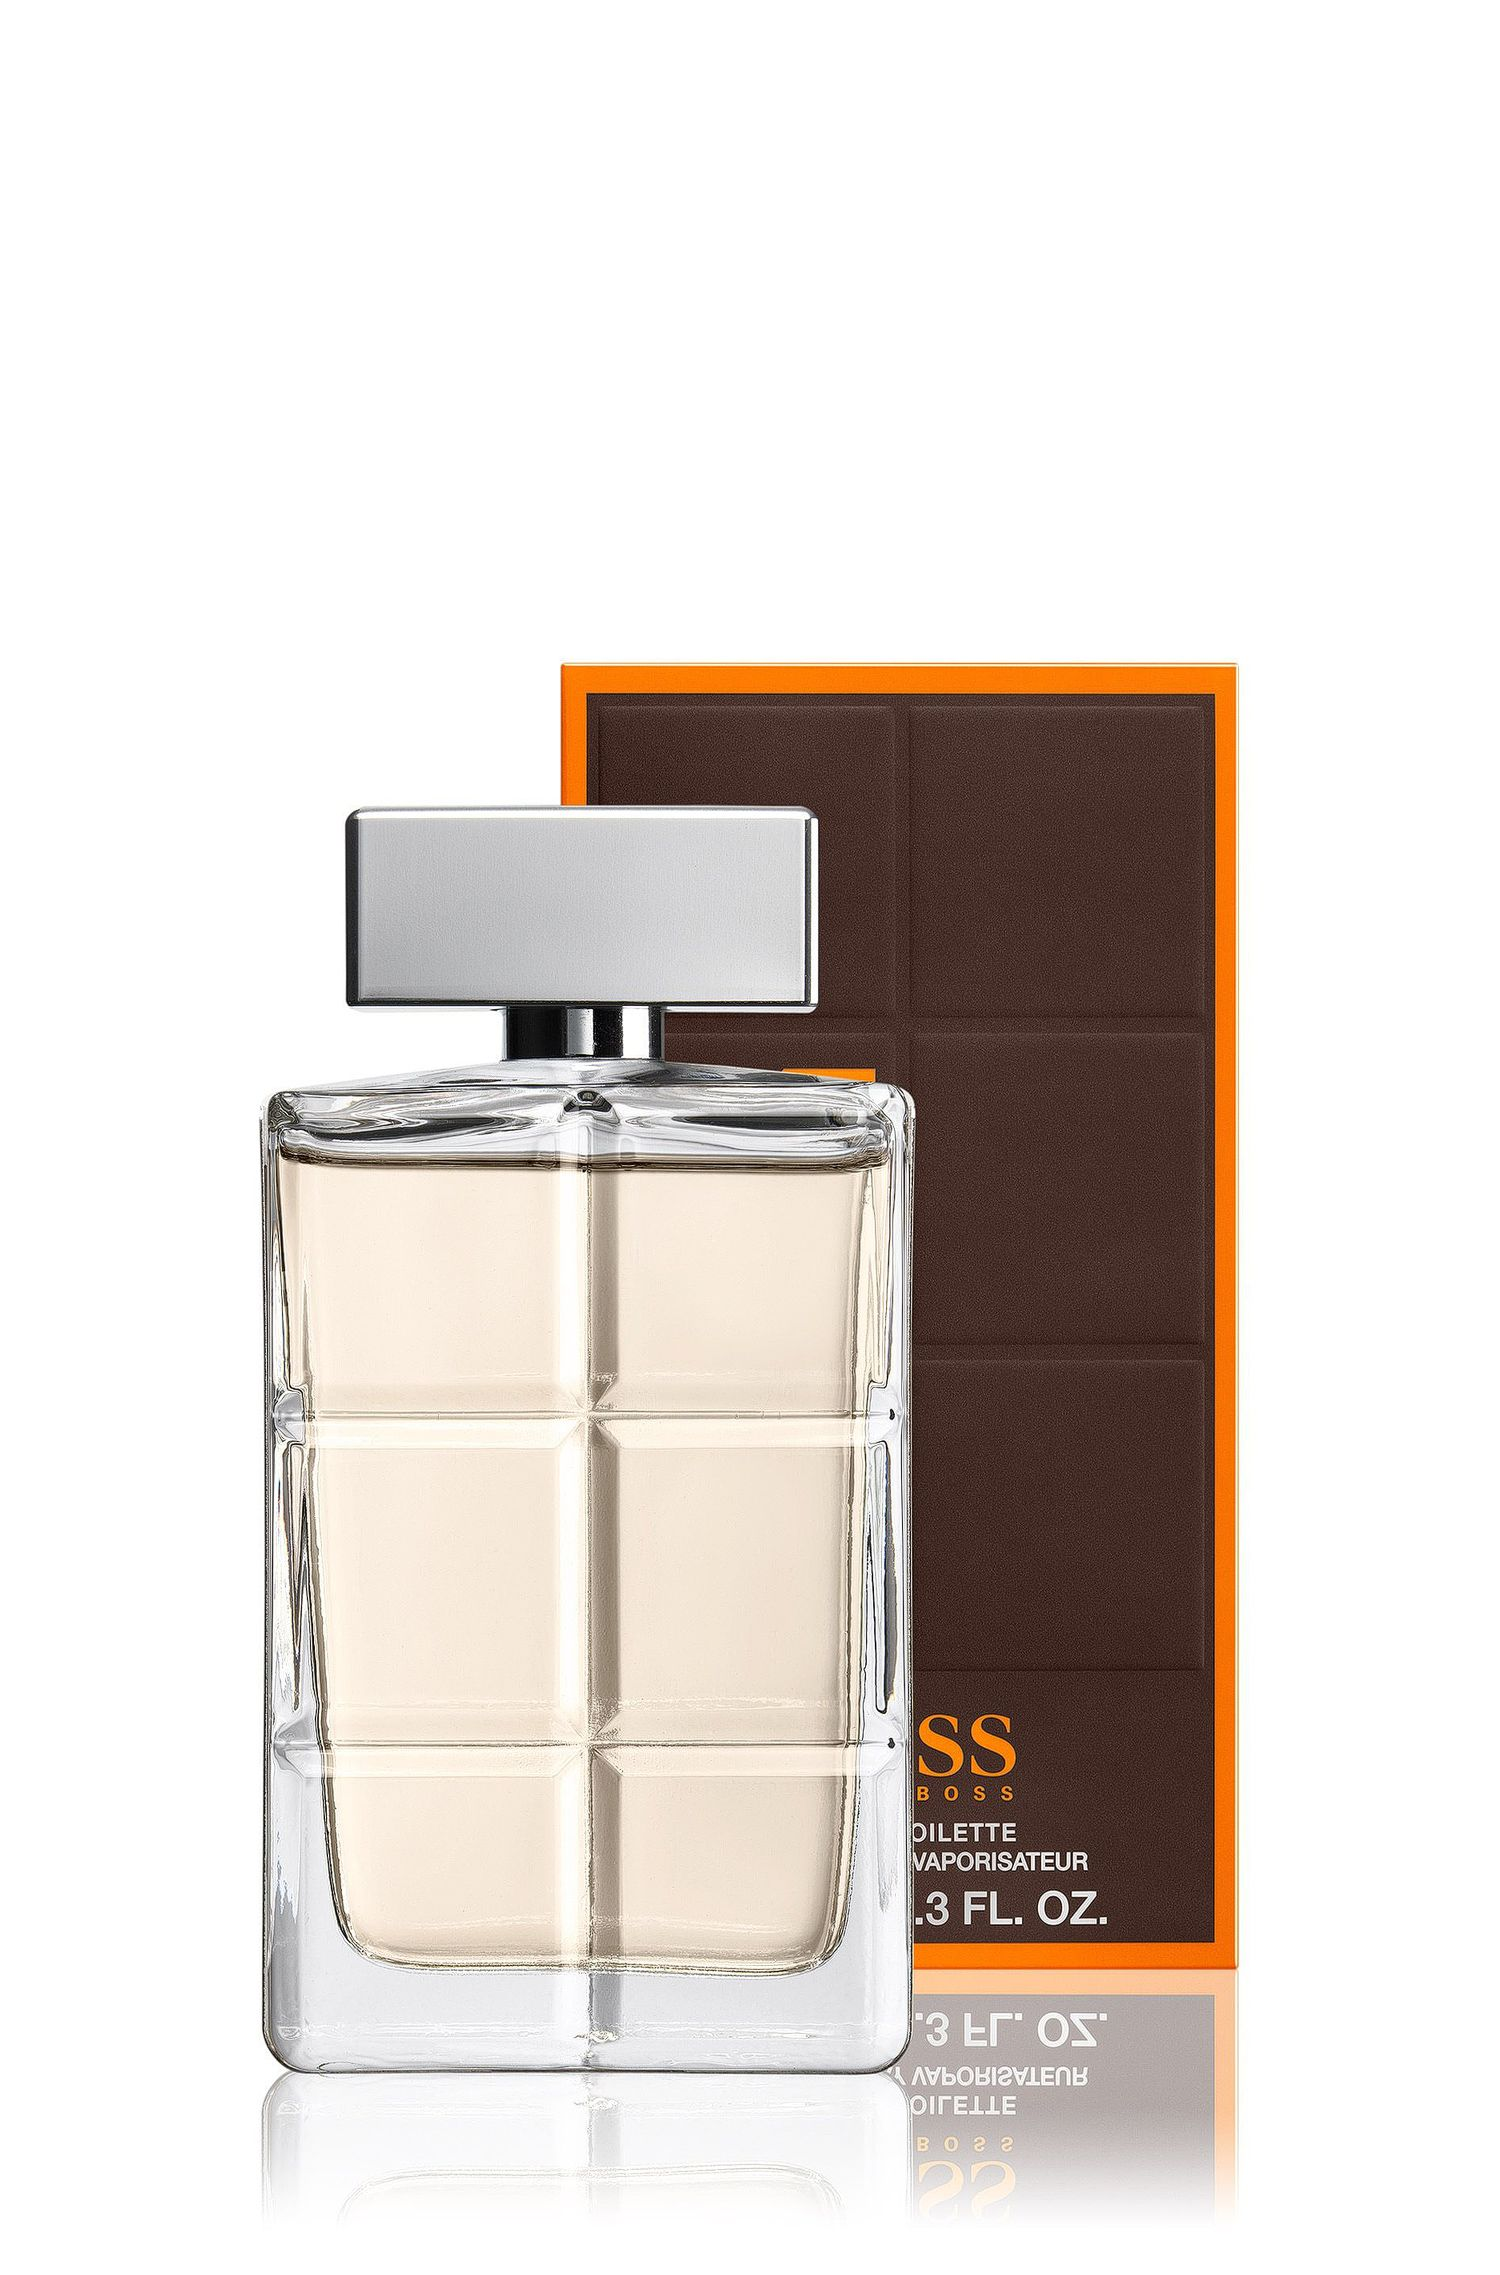 'BOSS Orange Man' | 3.3 fl. oz. (100 mL) Eau de Toilette